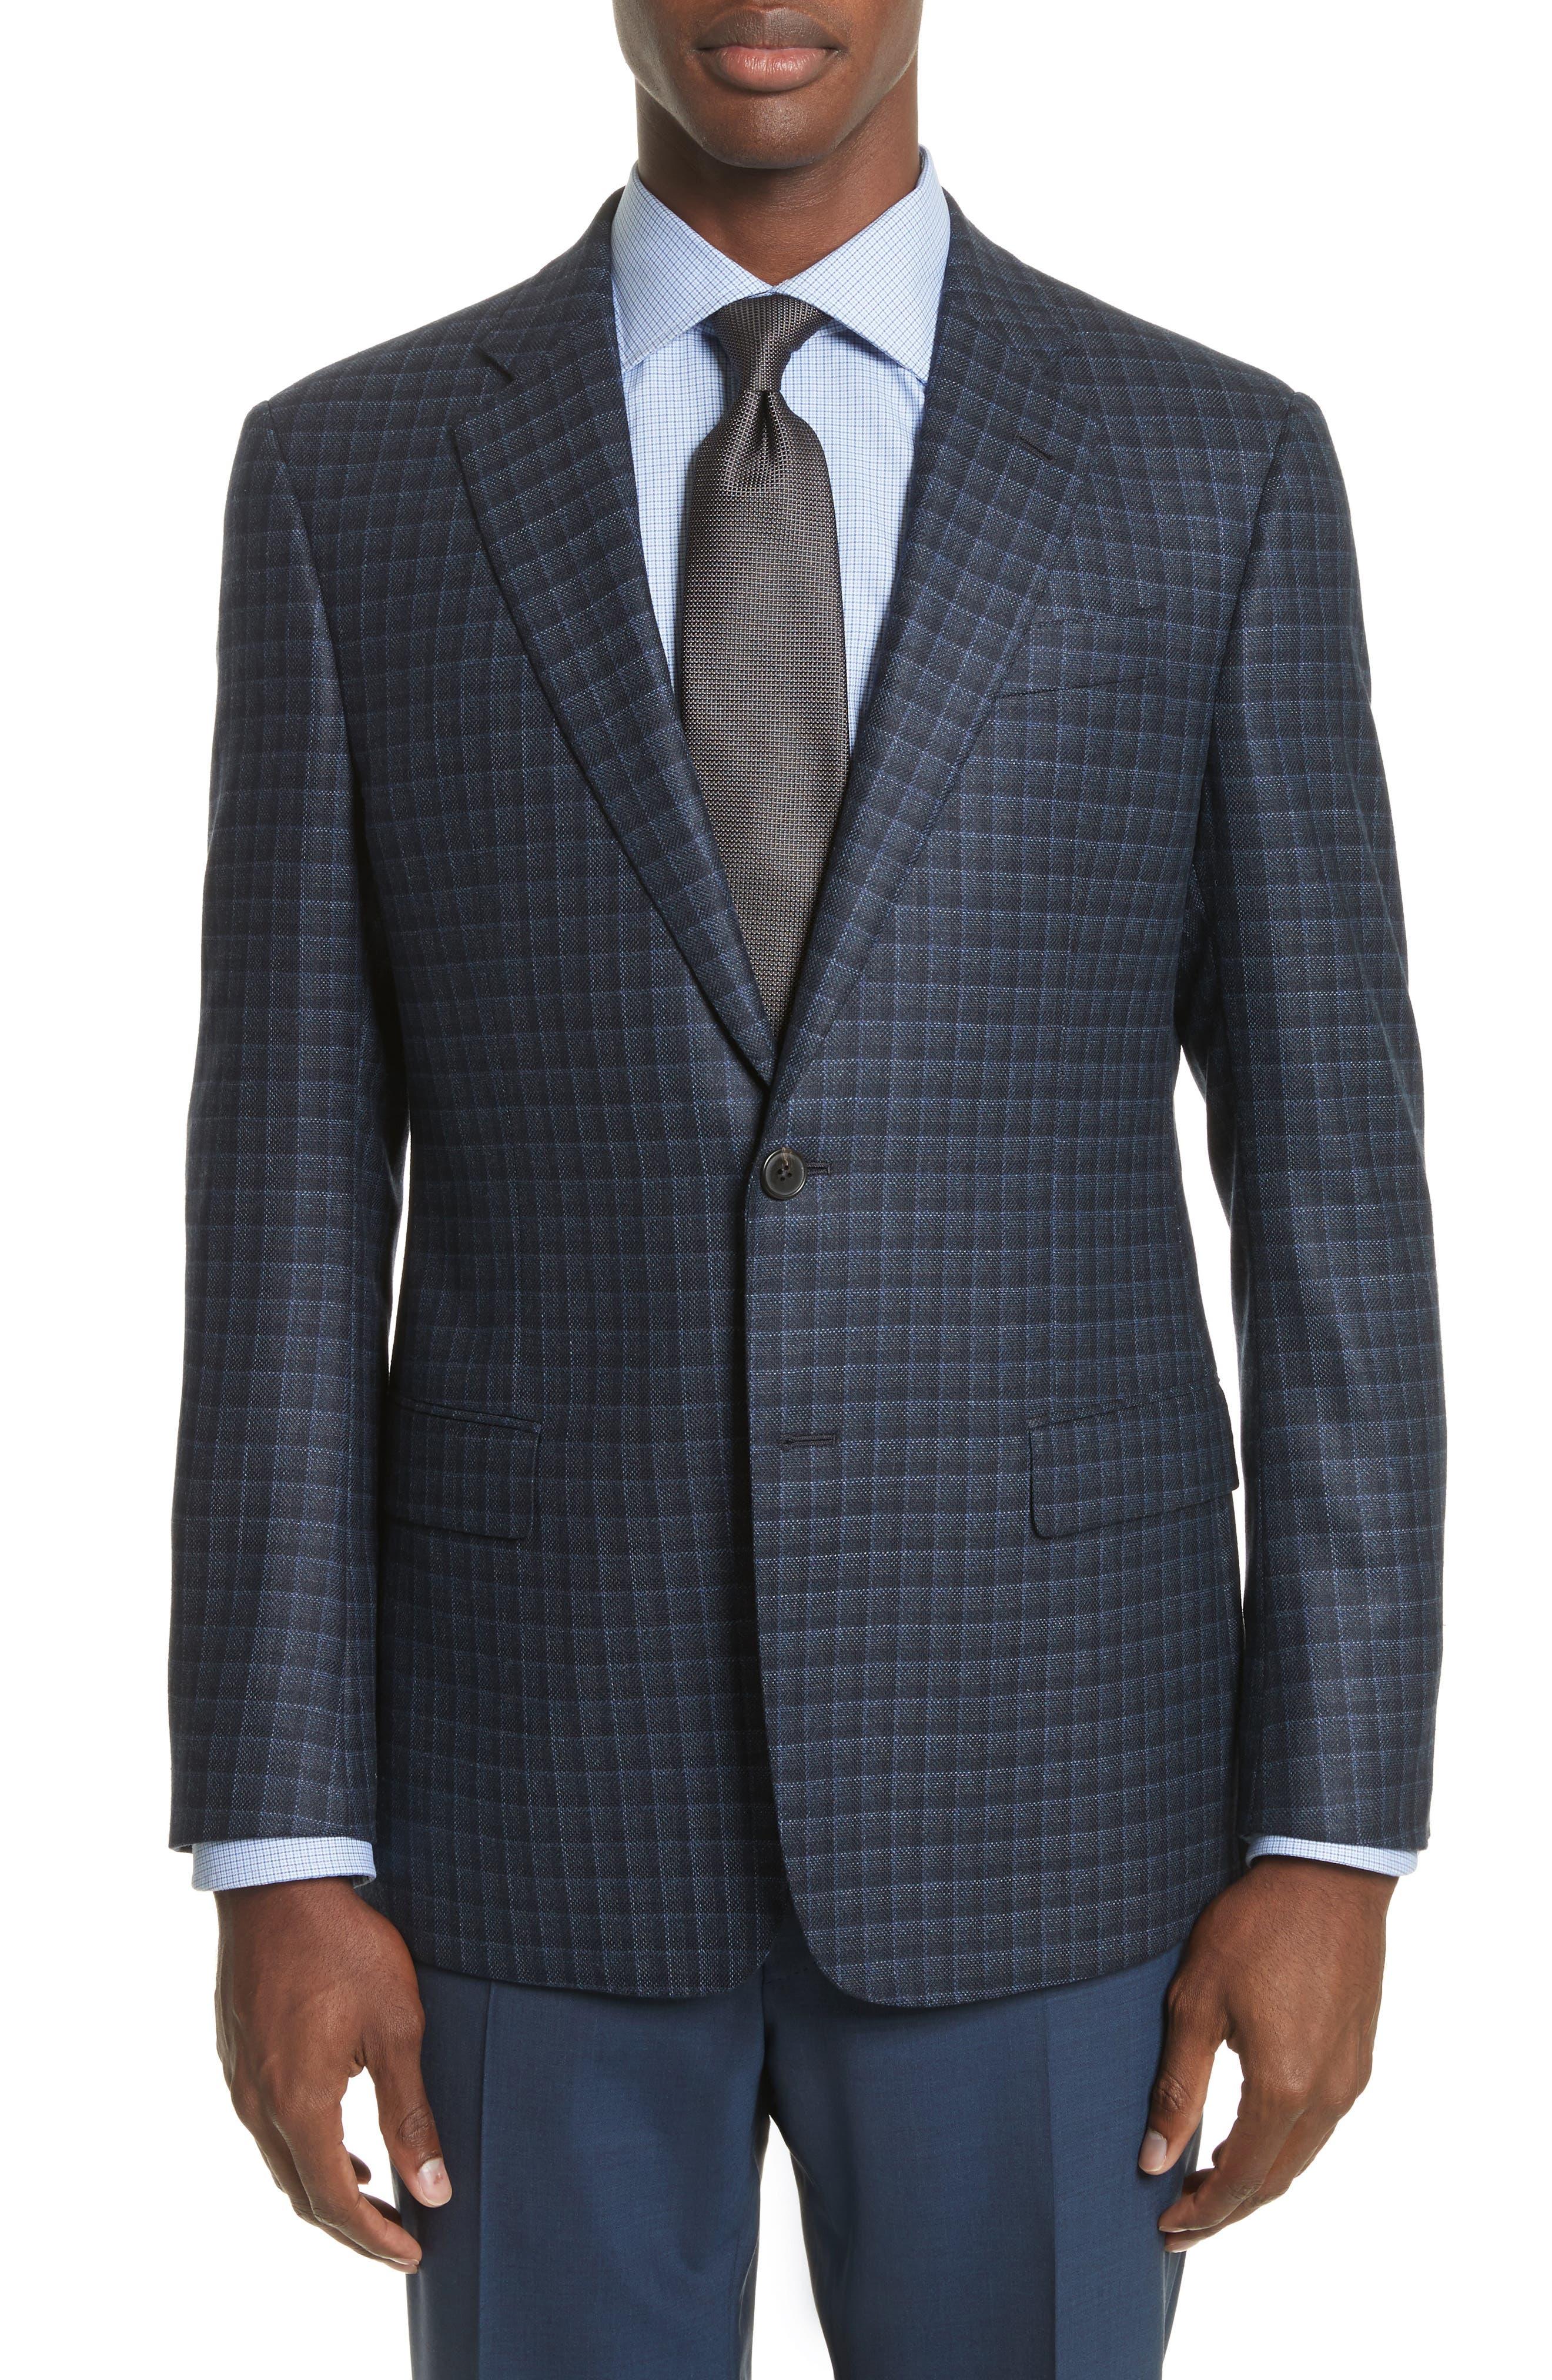 Main Image - Armani Collezioni G-Line Trim Fit Check Silk & Wool Sport Coat